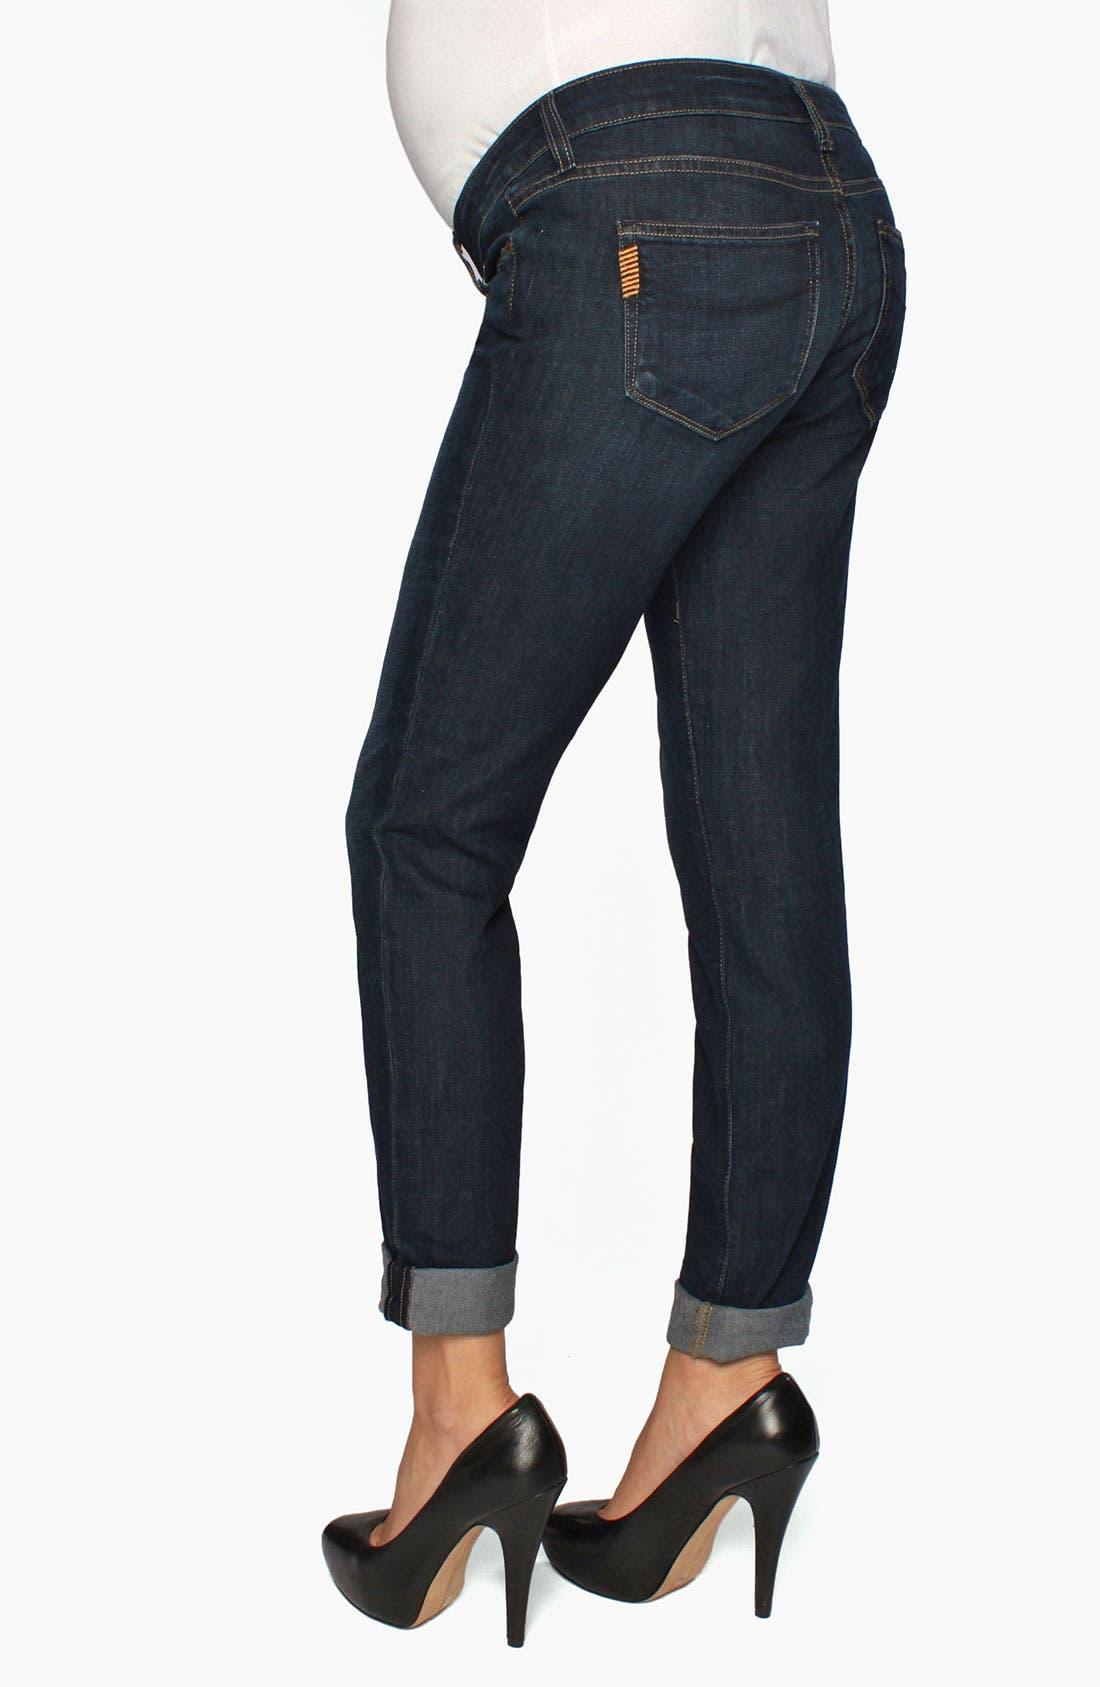 Main Image - Paige Denim 'Jimmy Jimmy Westbourne' Maternity Skinny Jeans (Gavin)